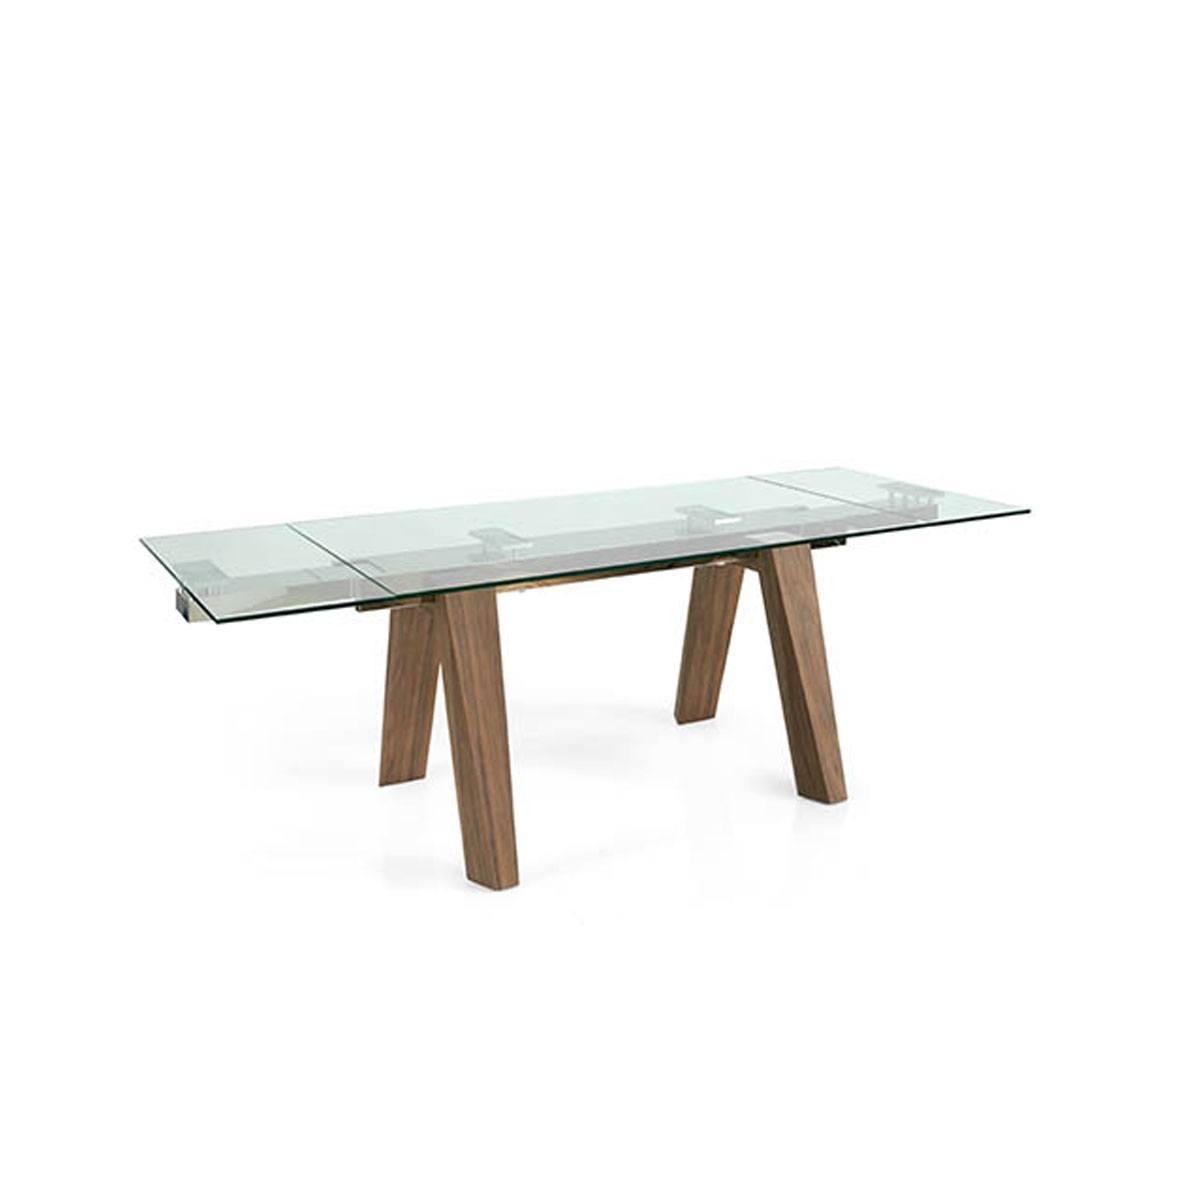 Mesa de comedor extensible cristal y madera robusta Súper